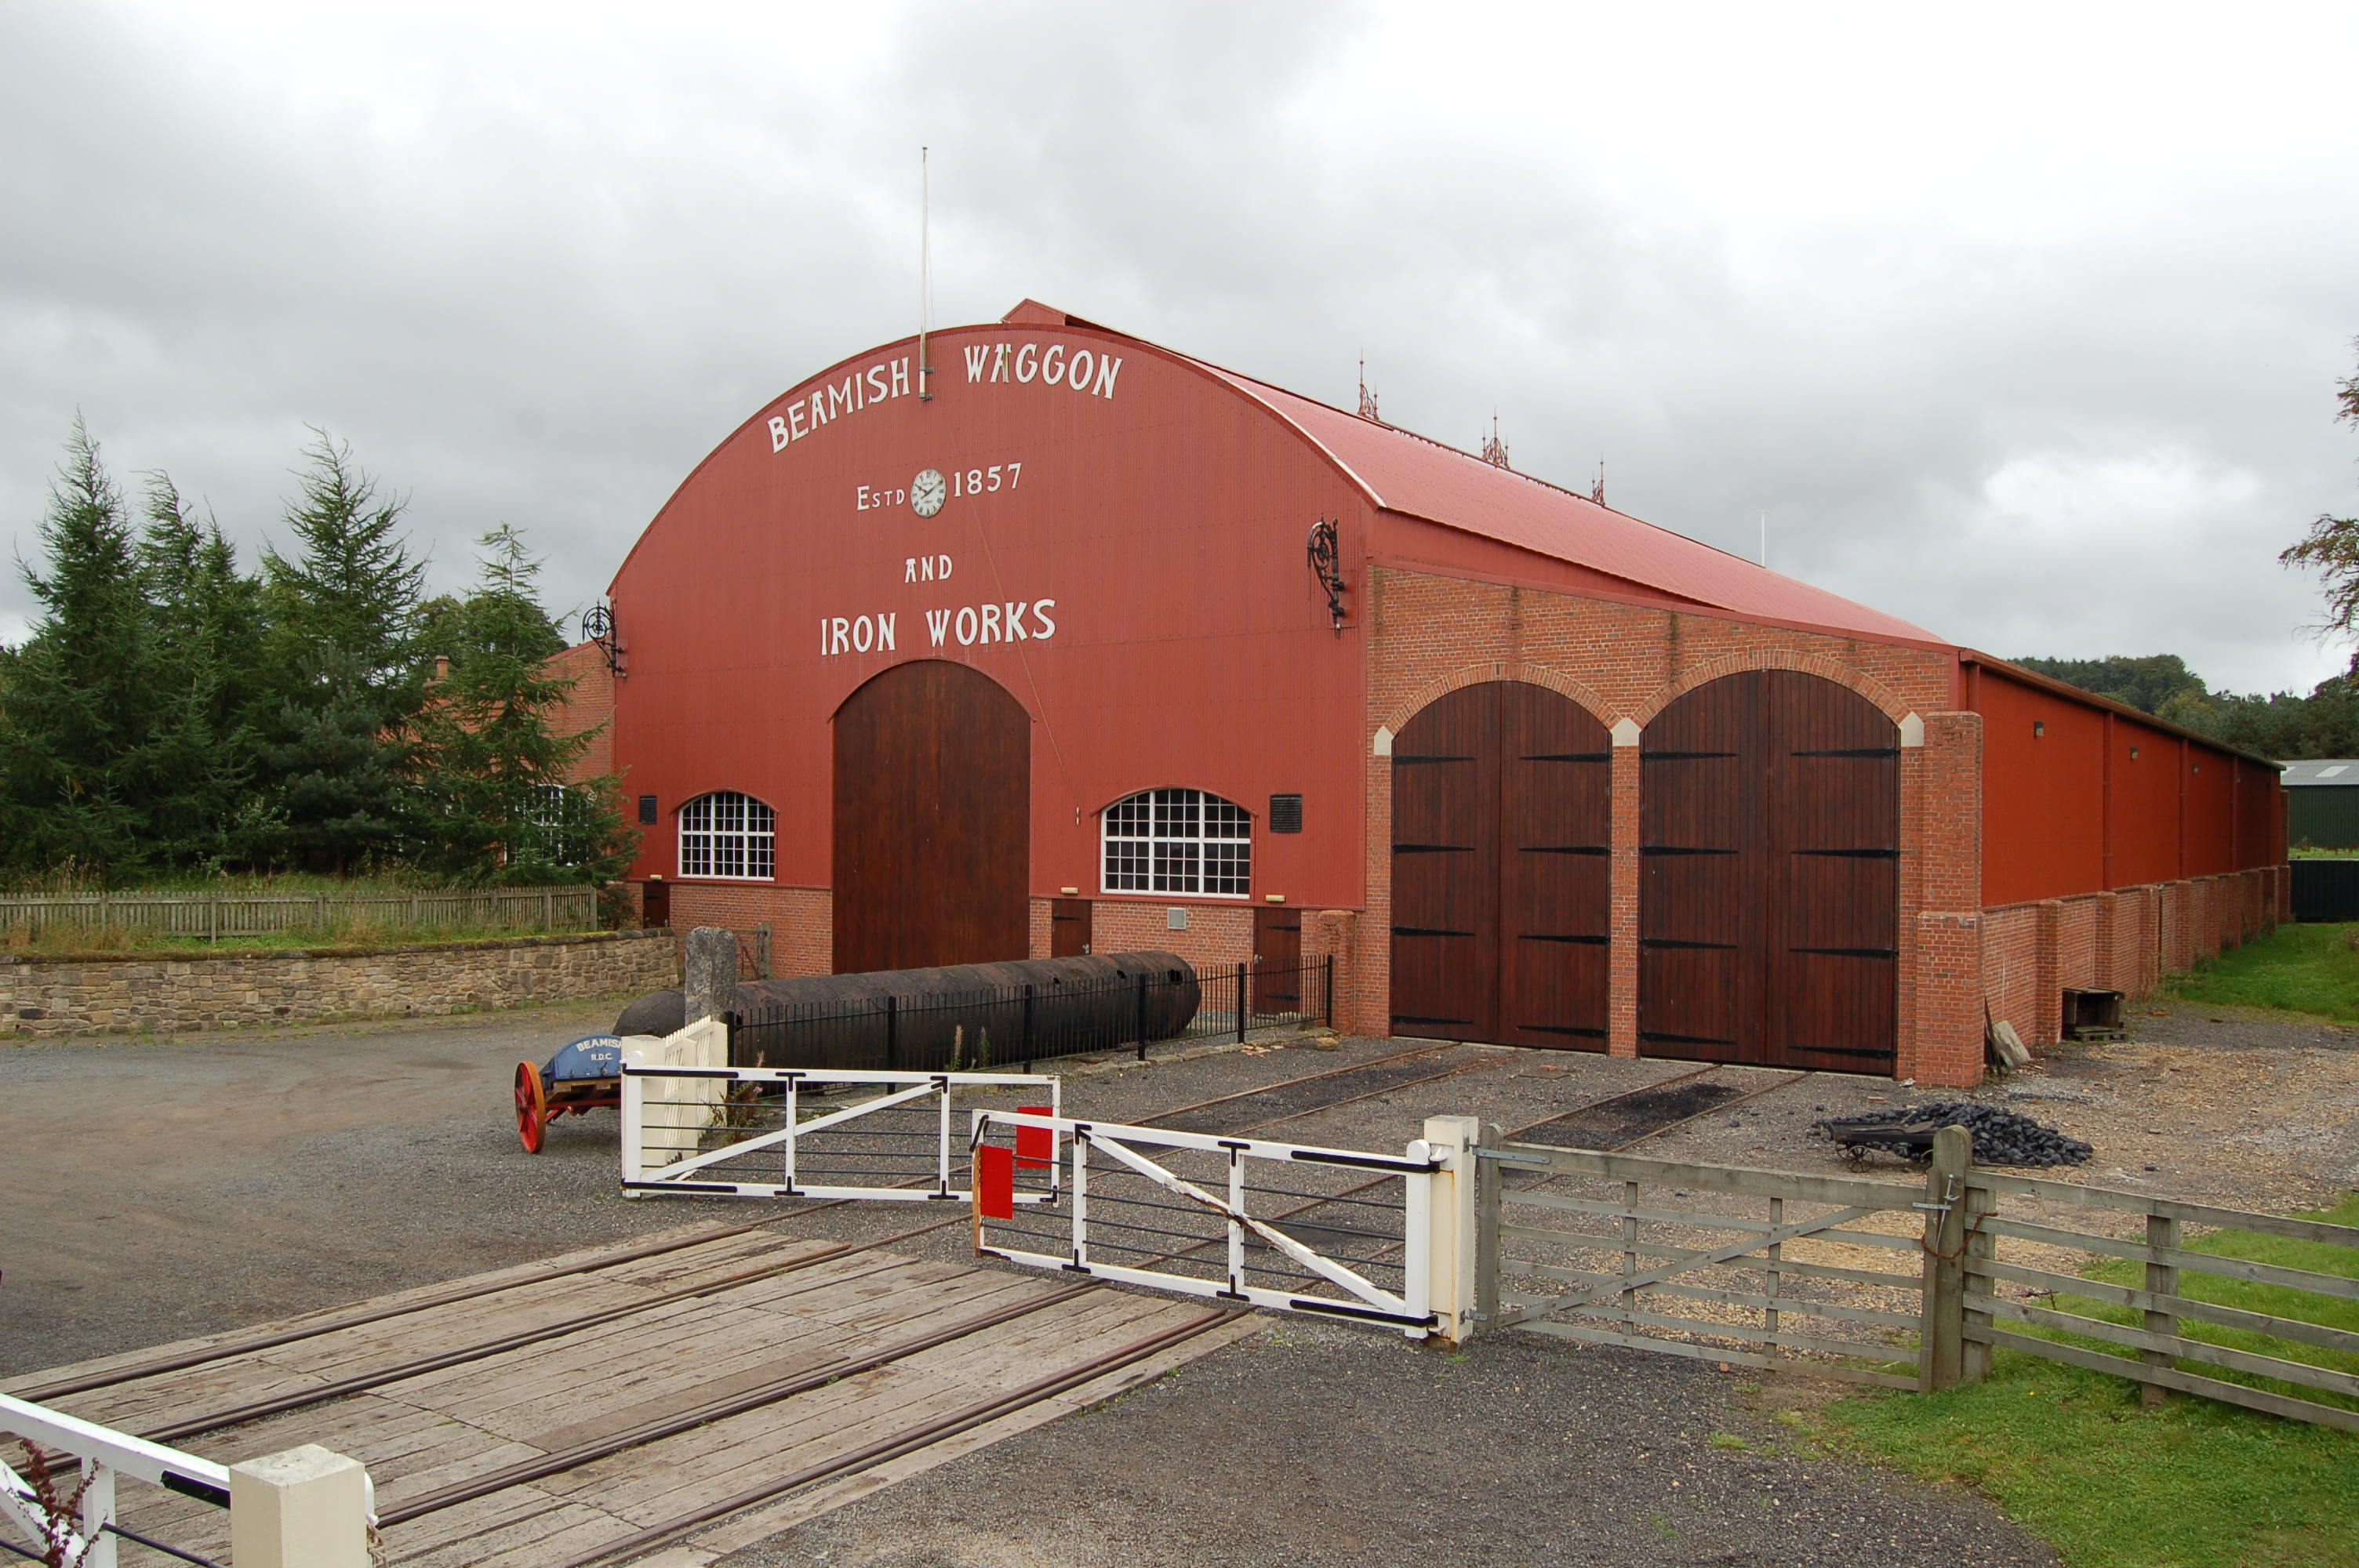 File:Consett tank wagon, Town railway goods yard, Beamish